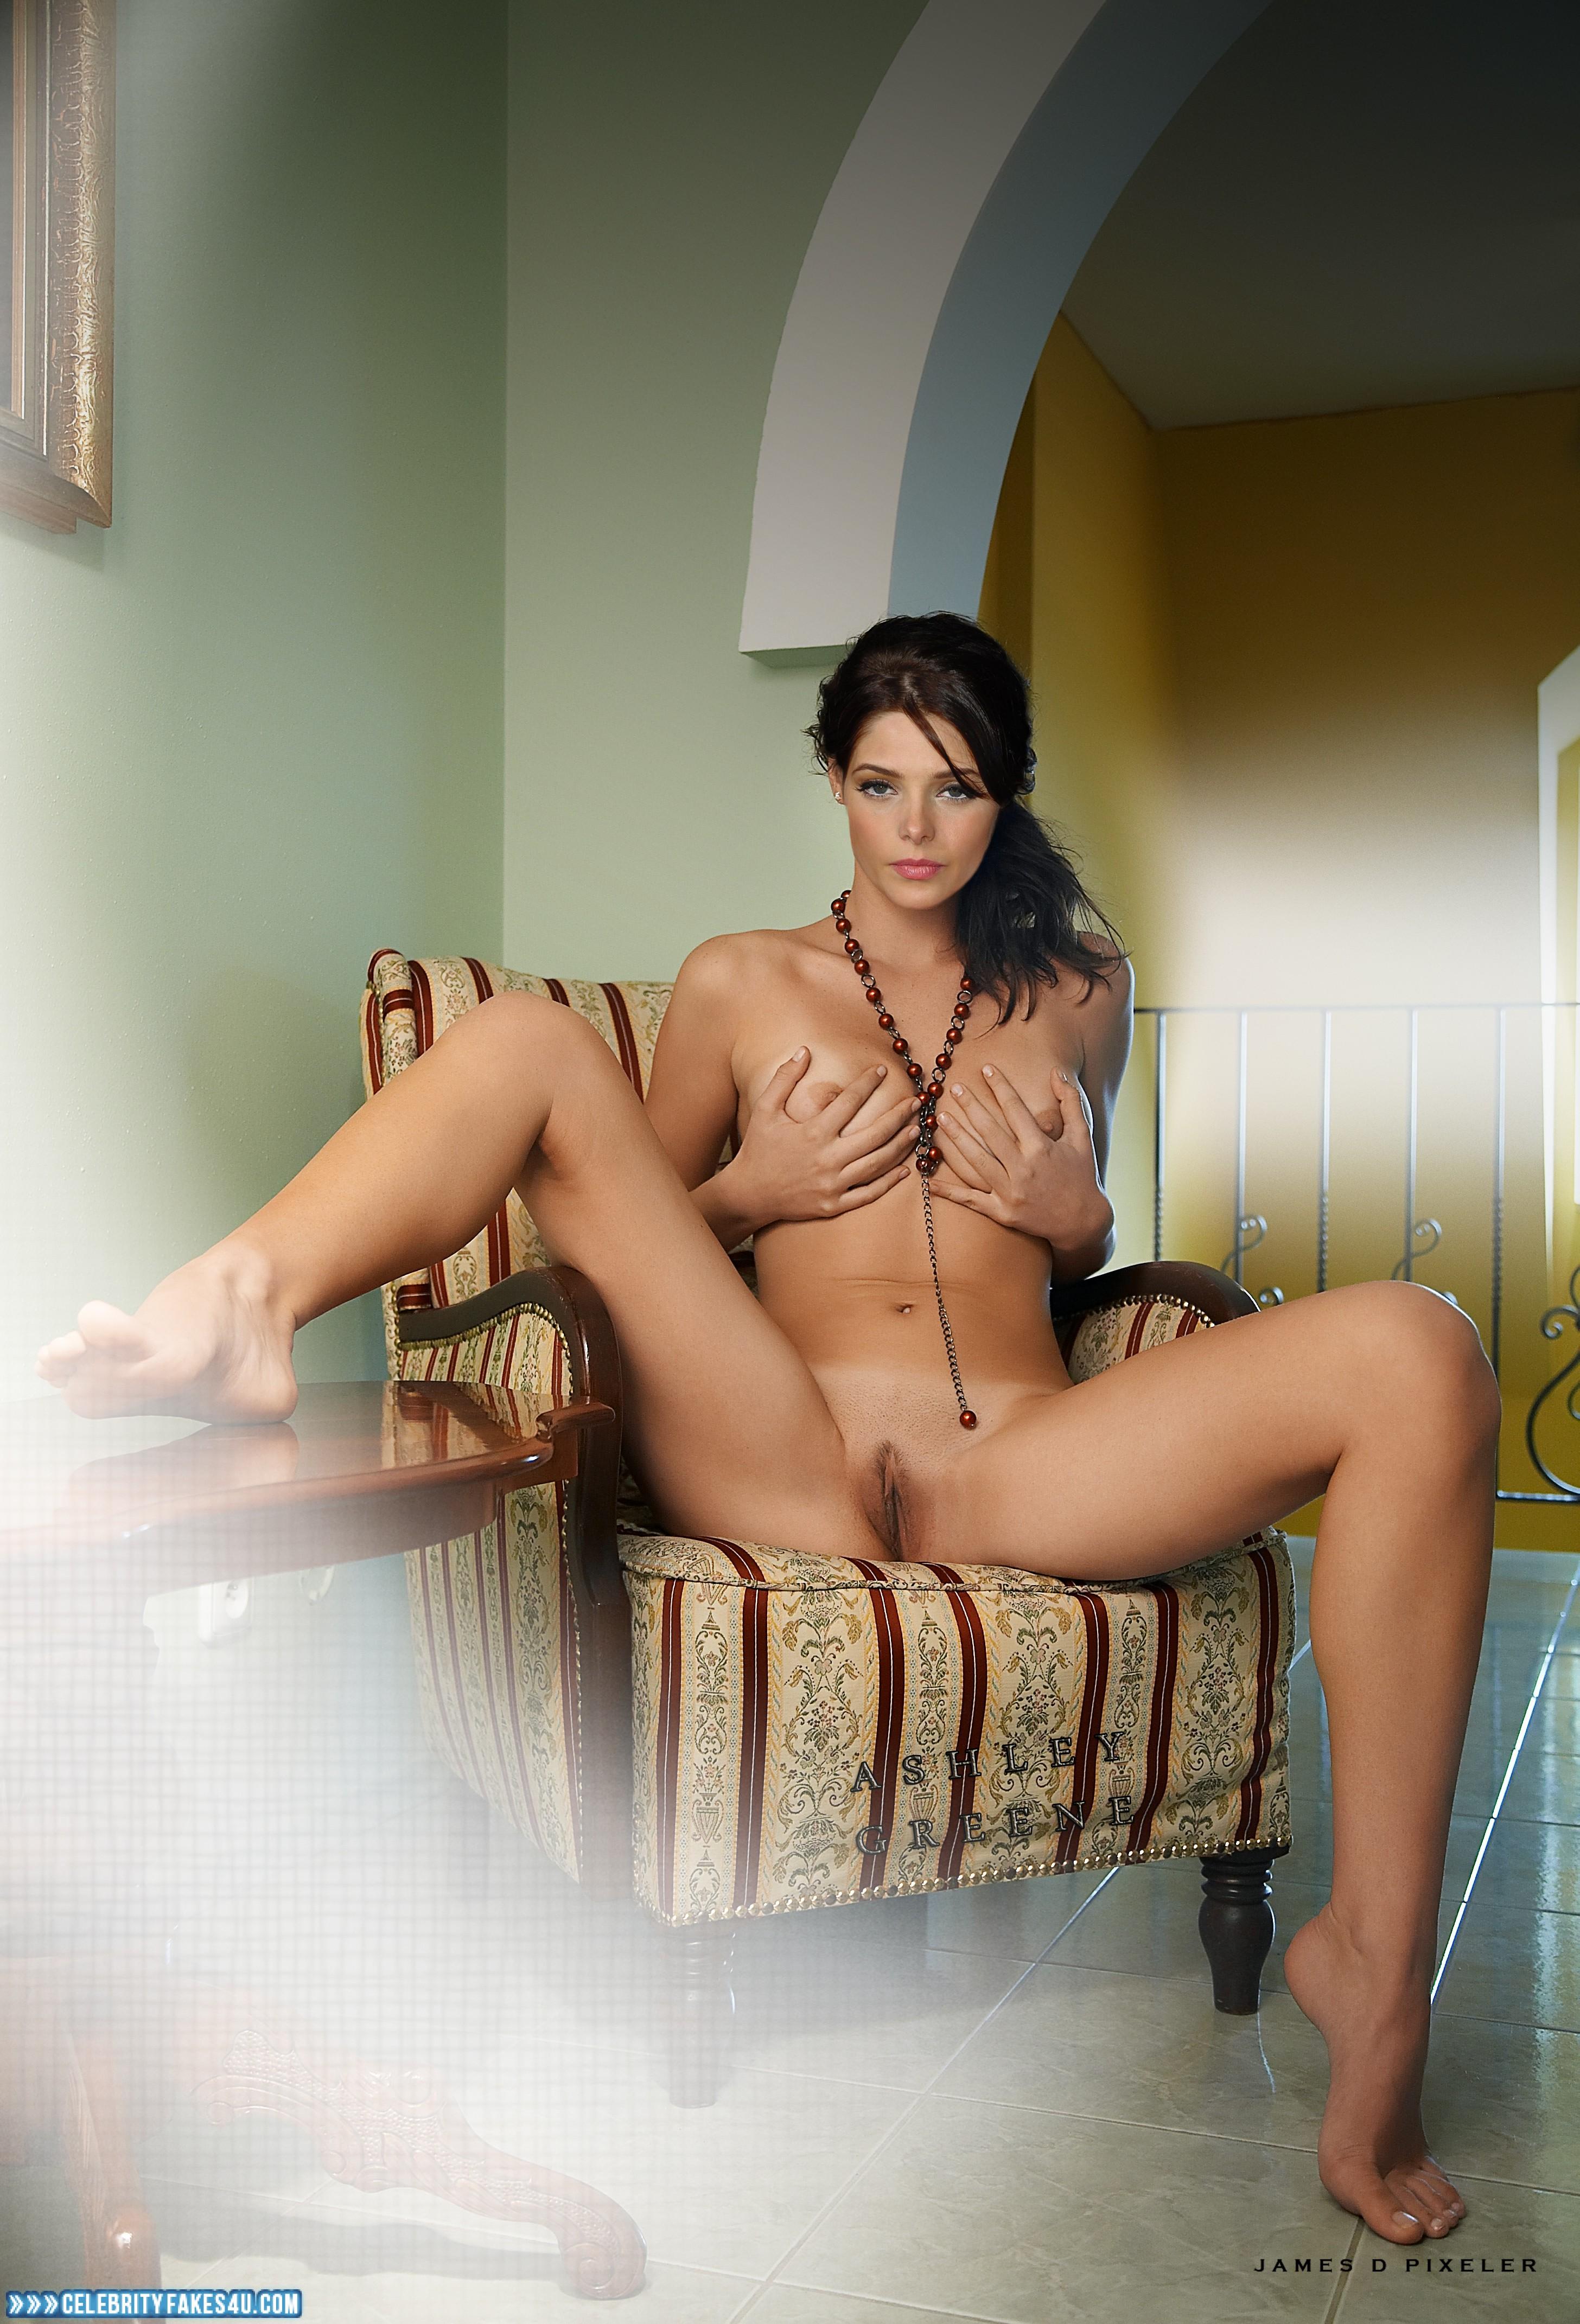 newzeland girls sex vidoes